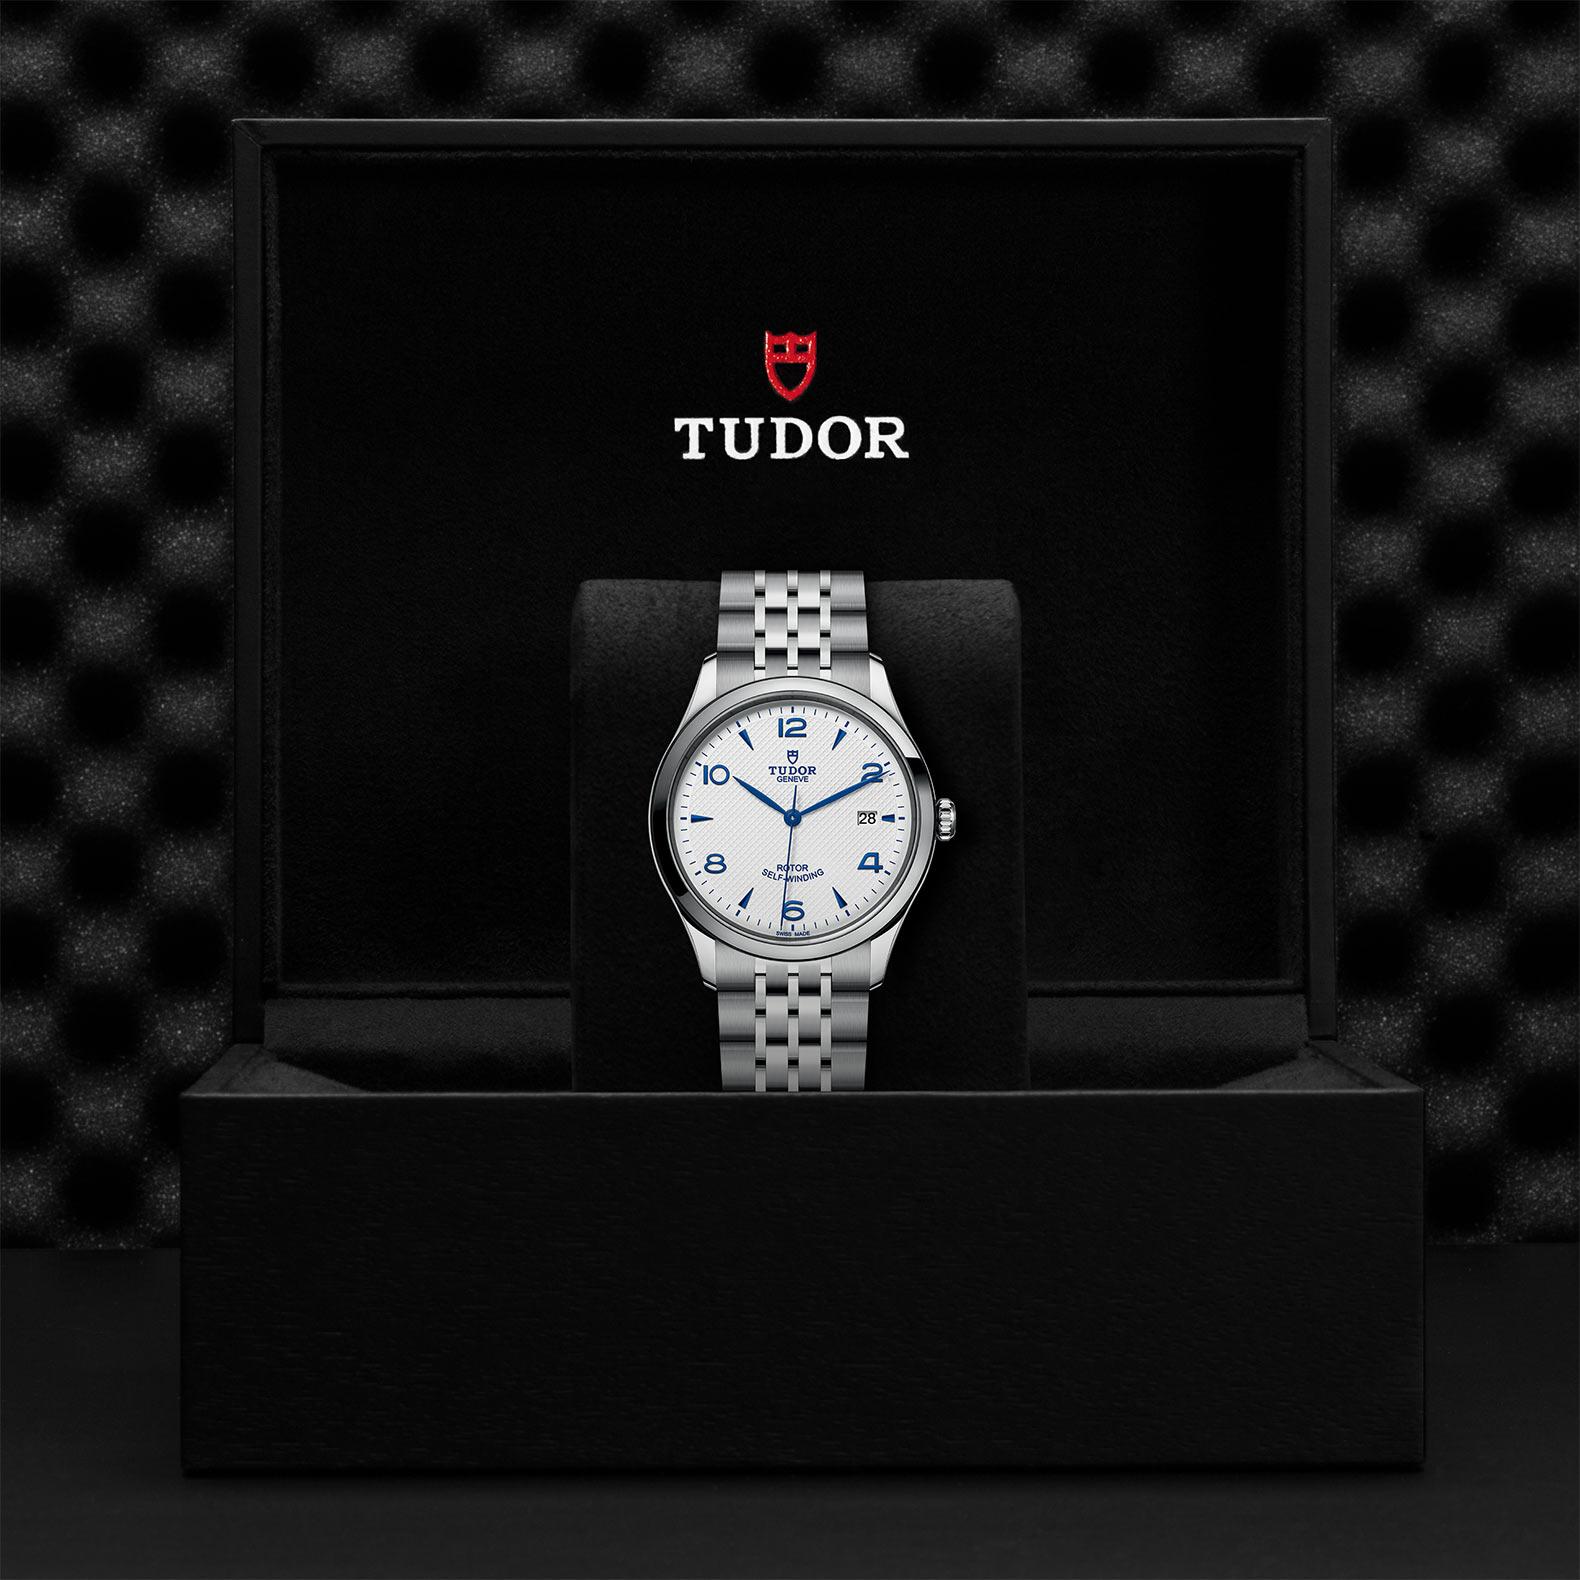 Tudor_M91550-0005